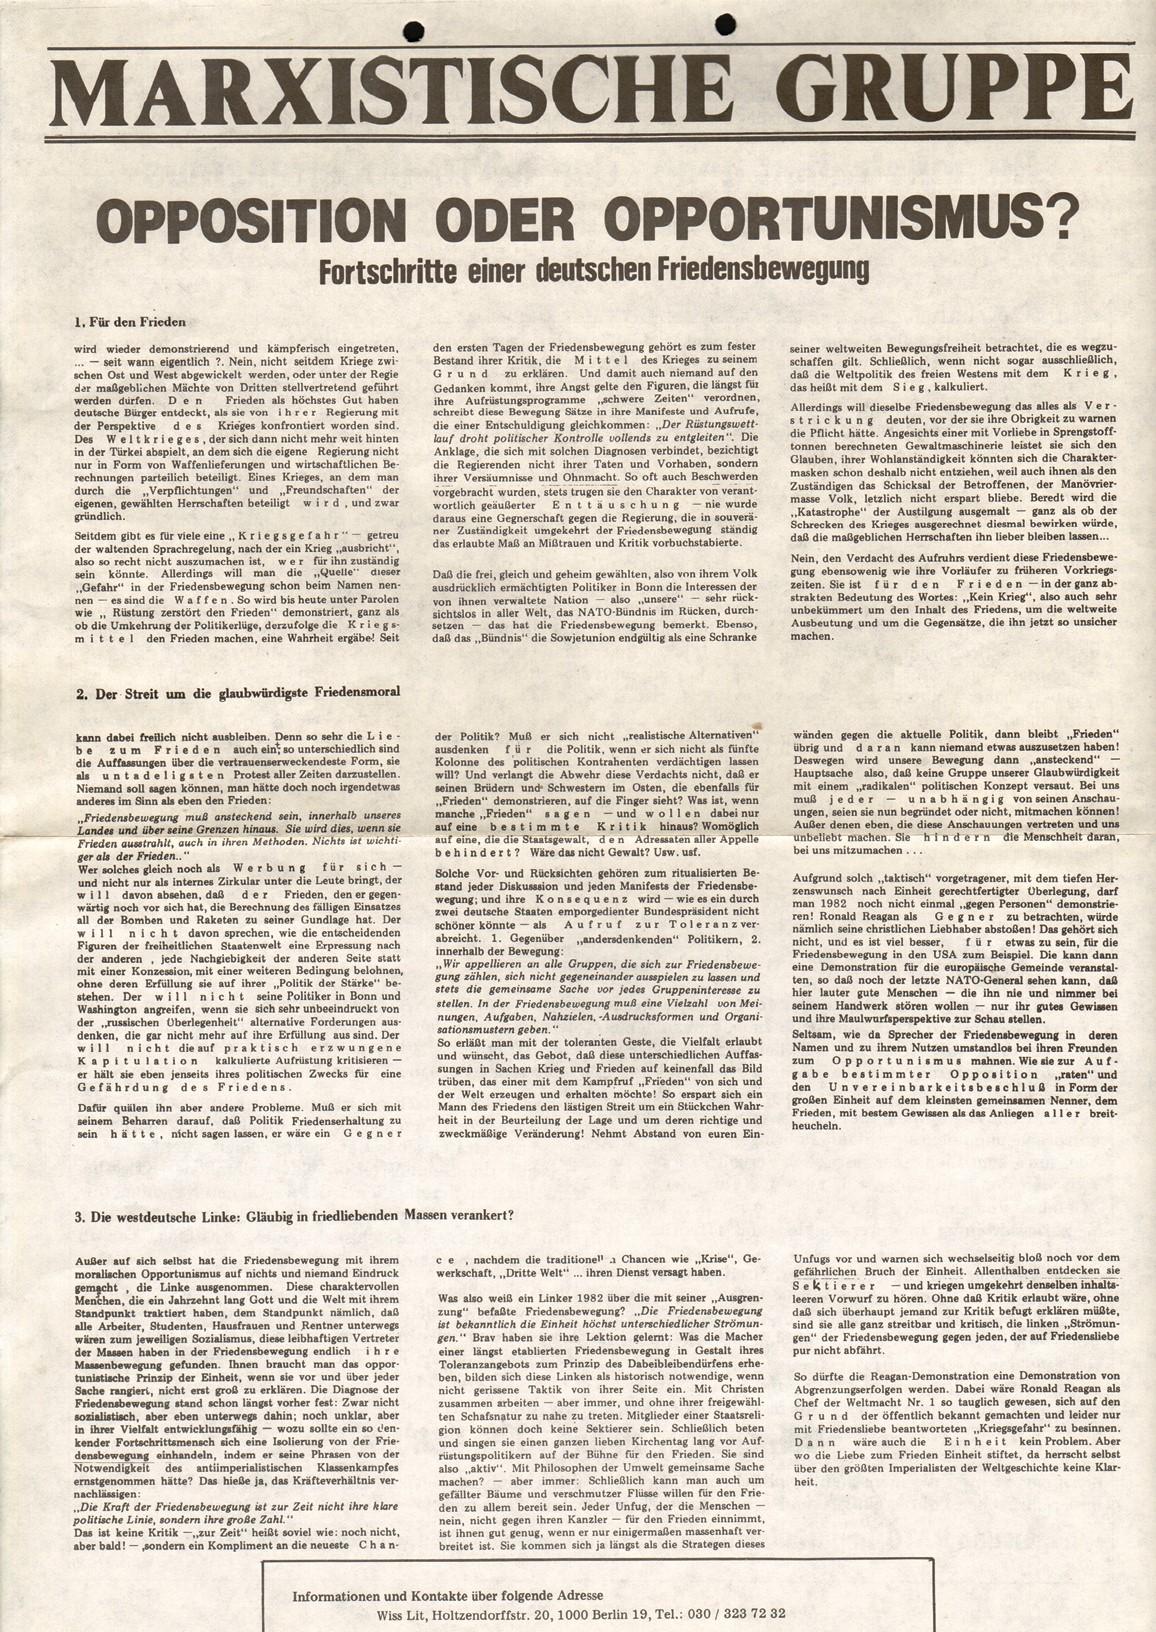 Berlin_MG_FB_19820600_01